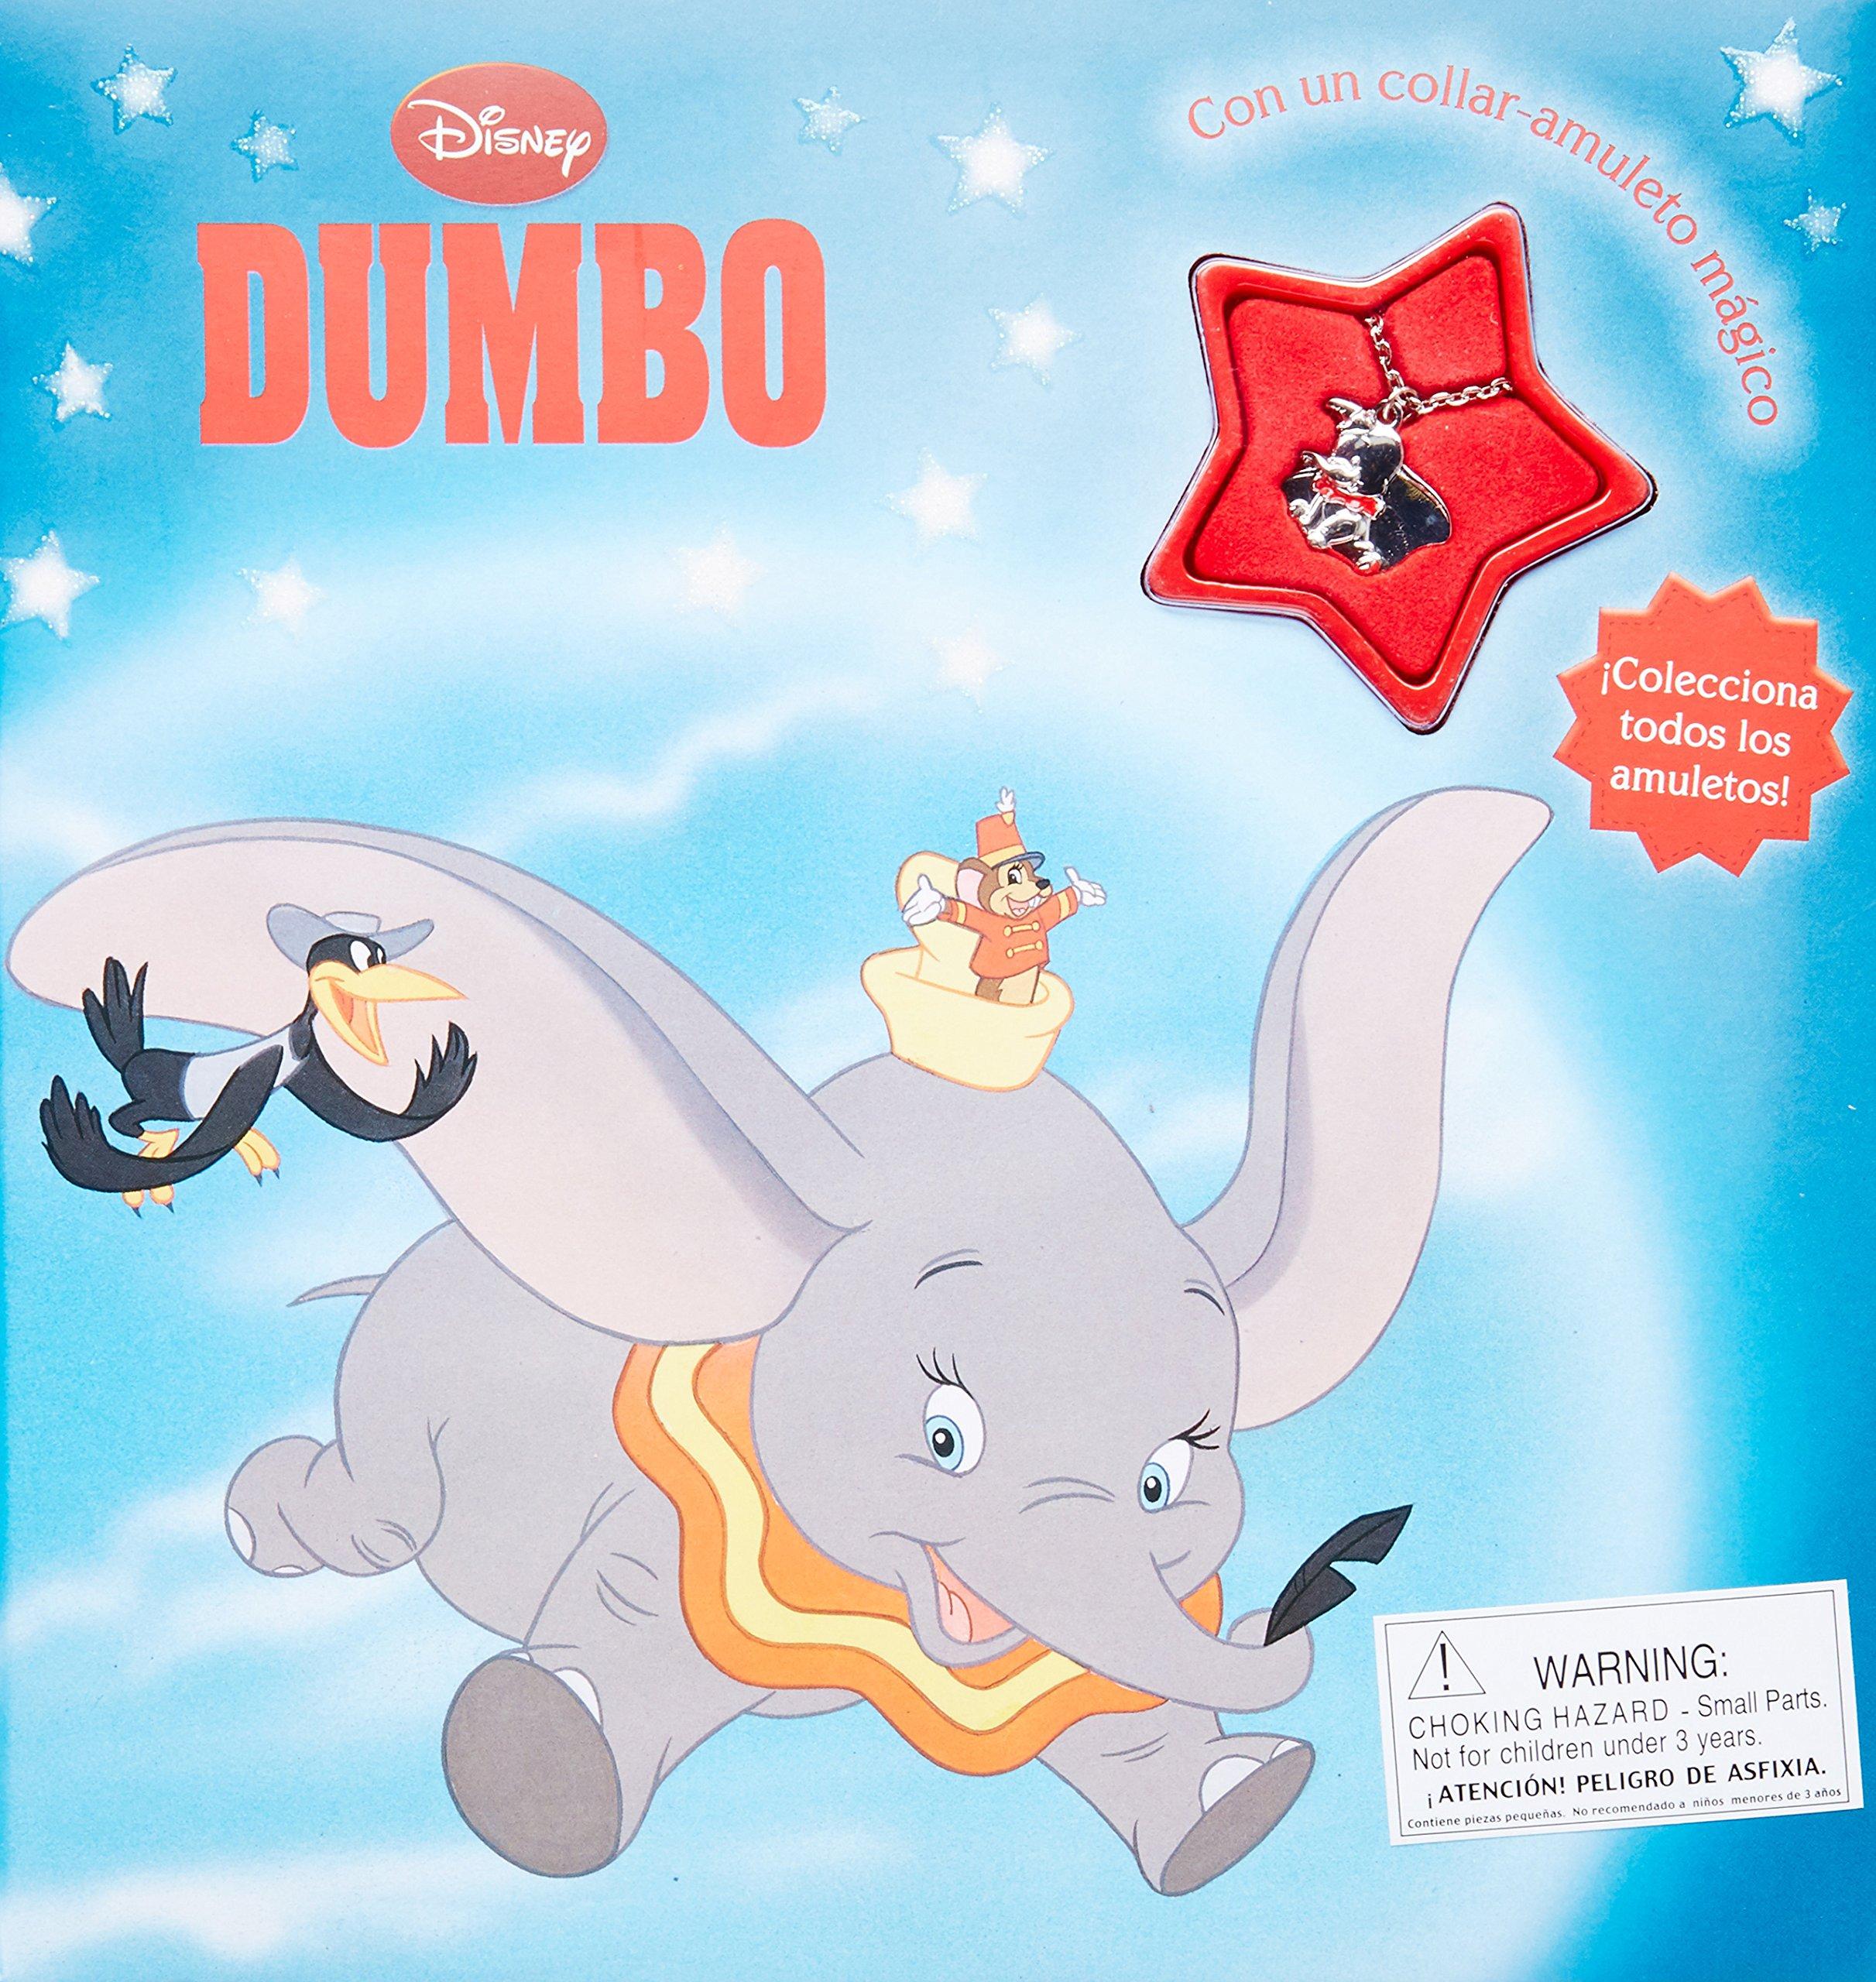 Download Disney Dumbo con un collar-amuleto magico (Disney Charm) (Spanish Edition) pdf epub